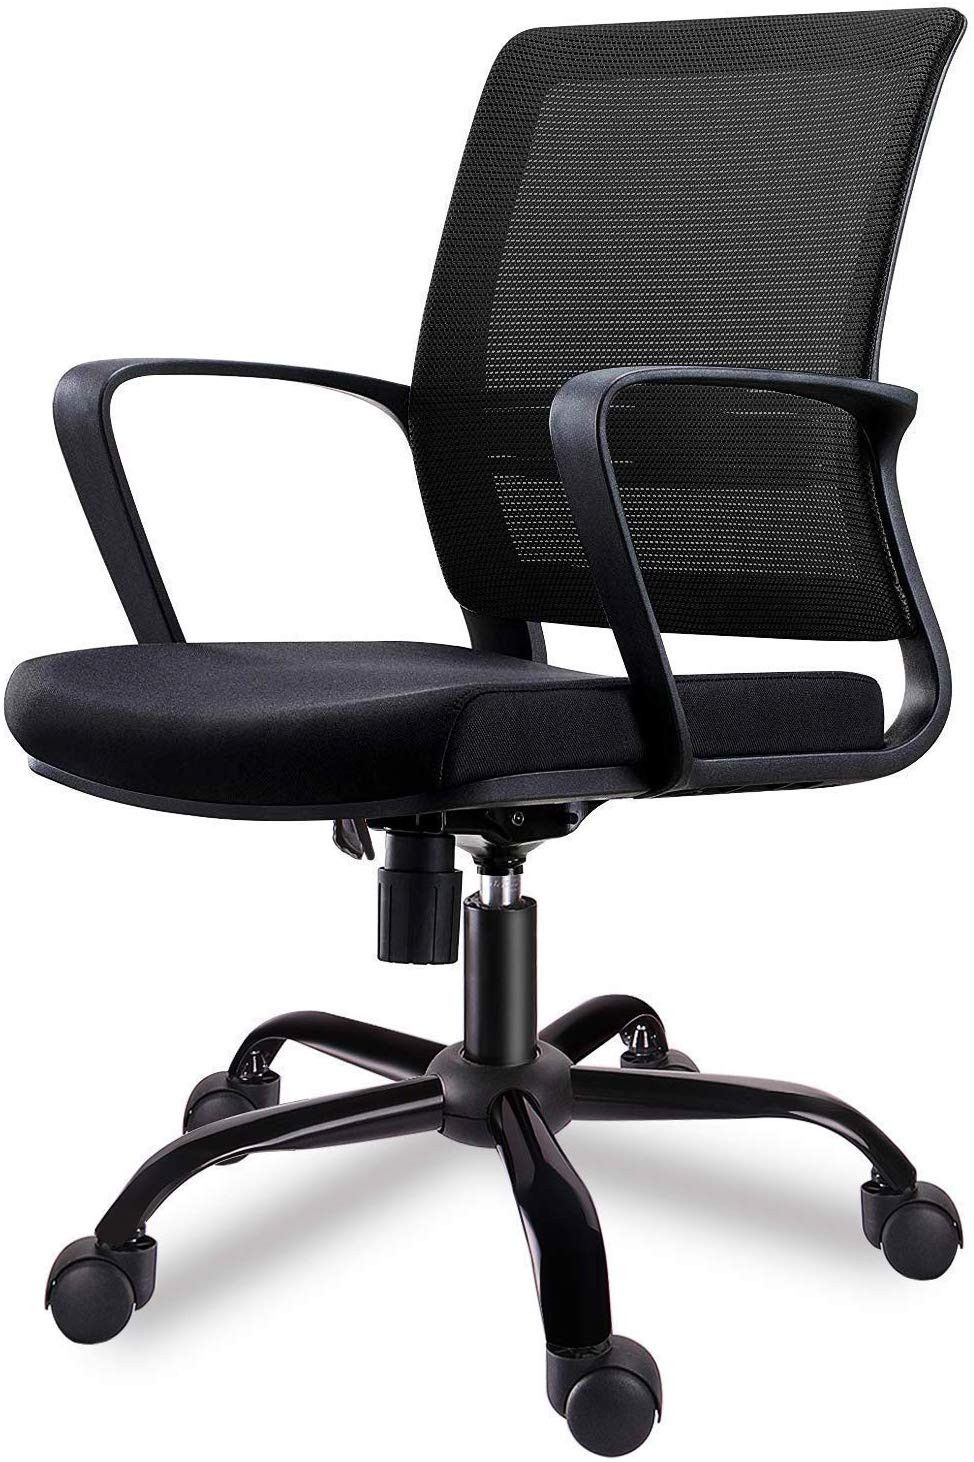 Best Computer Chair 2021 Best Ergonomic Office Chairs 2021 in 2020 | Best ergonomic office